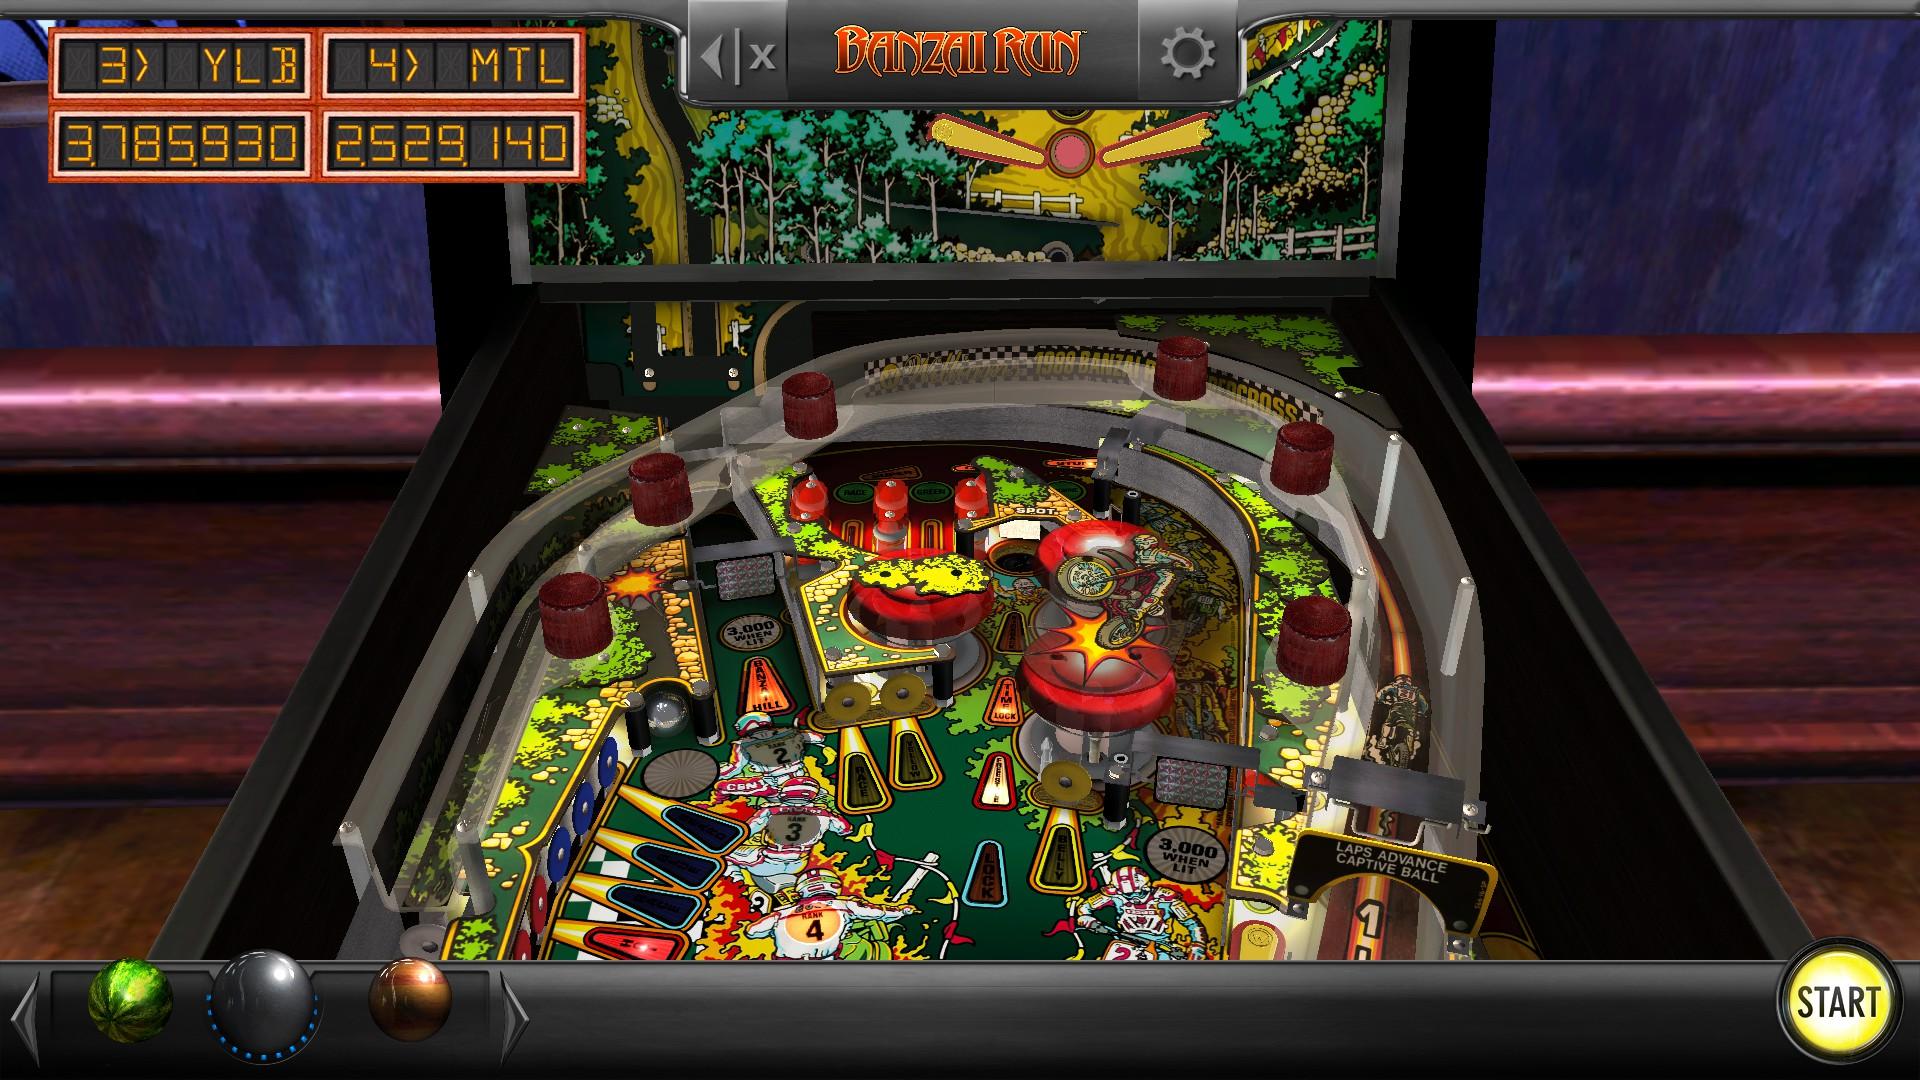 Mantalow: Pinball Arcade: Banzai Run (PC) 2,529,140 points on 2018-03-12 12:14:51